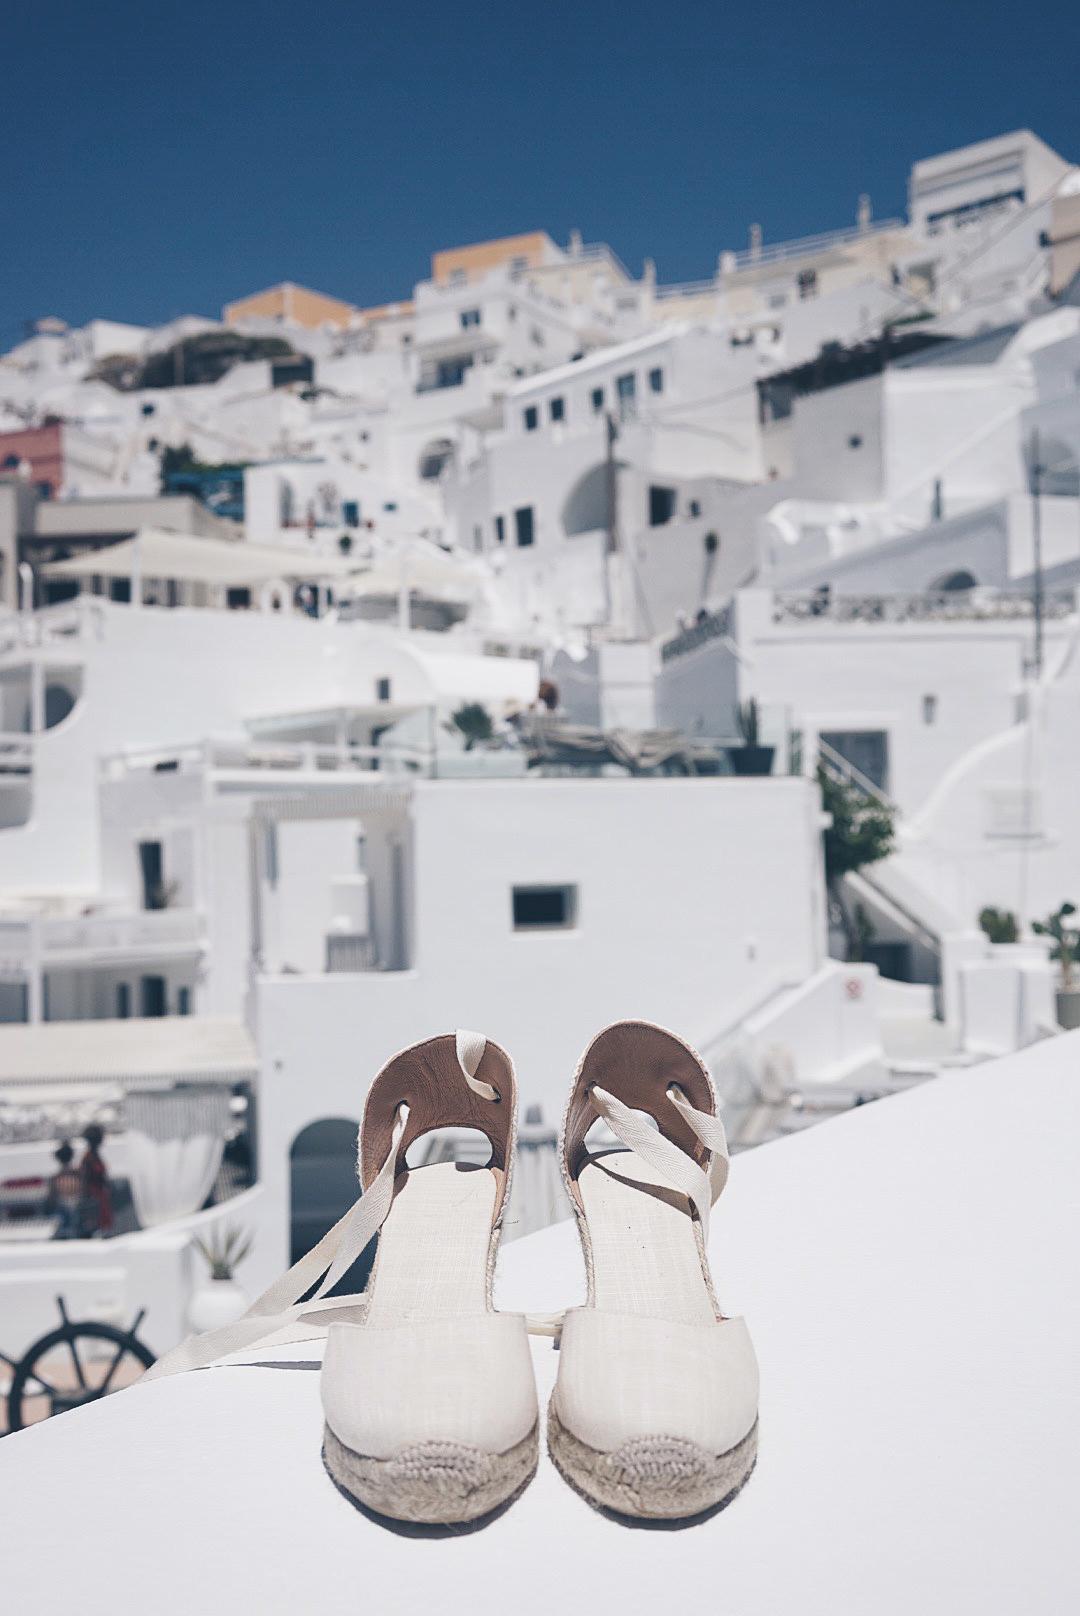 Blue_Dress-Soludos_Escapes-Soludos_Espadrilles-Canotier-Hat-Lack_Of_Color-Summer-Santorini-Collage_Vintage-110